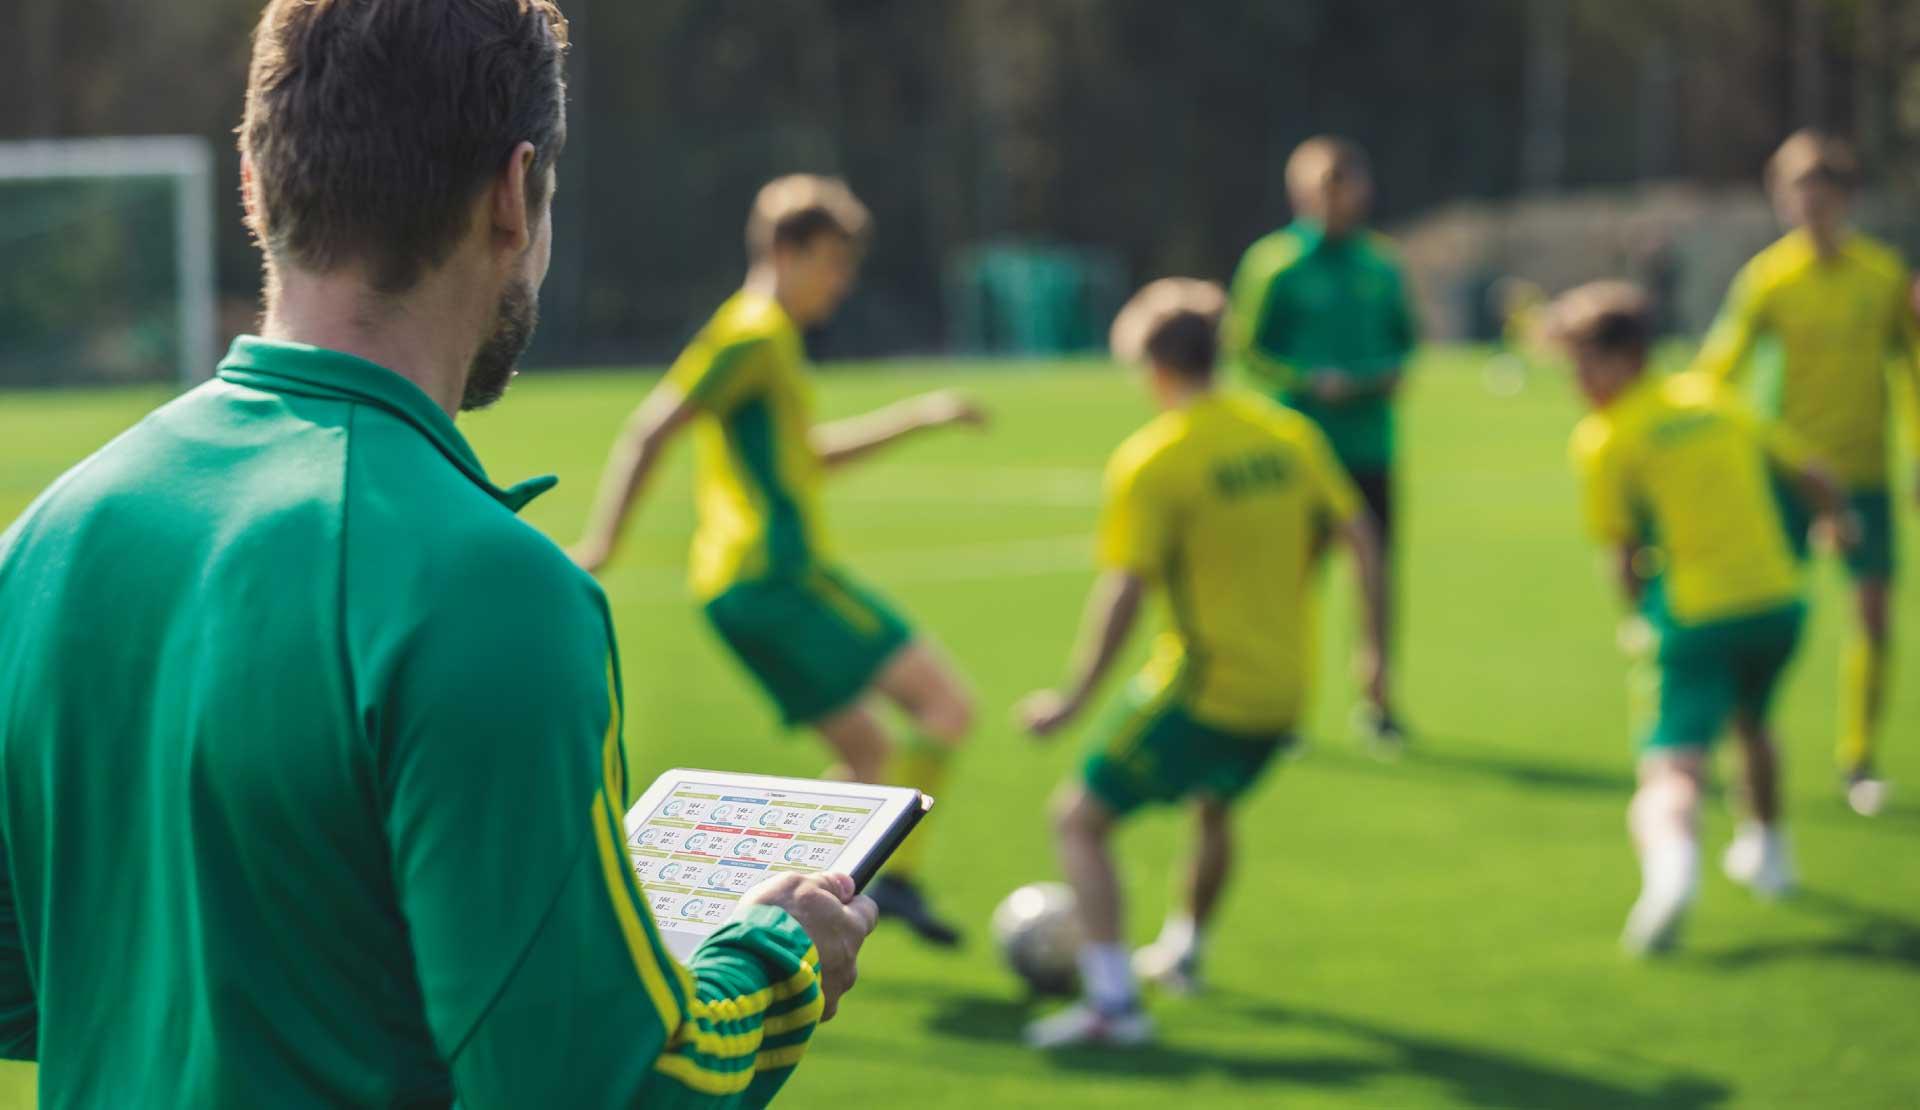 rendimiento-deporte-tecnologia